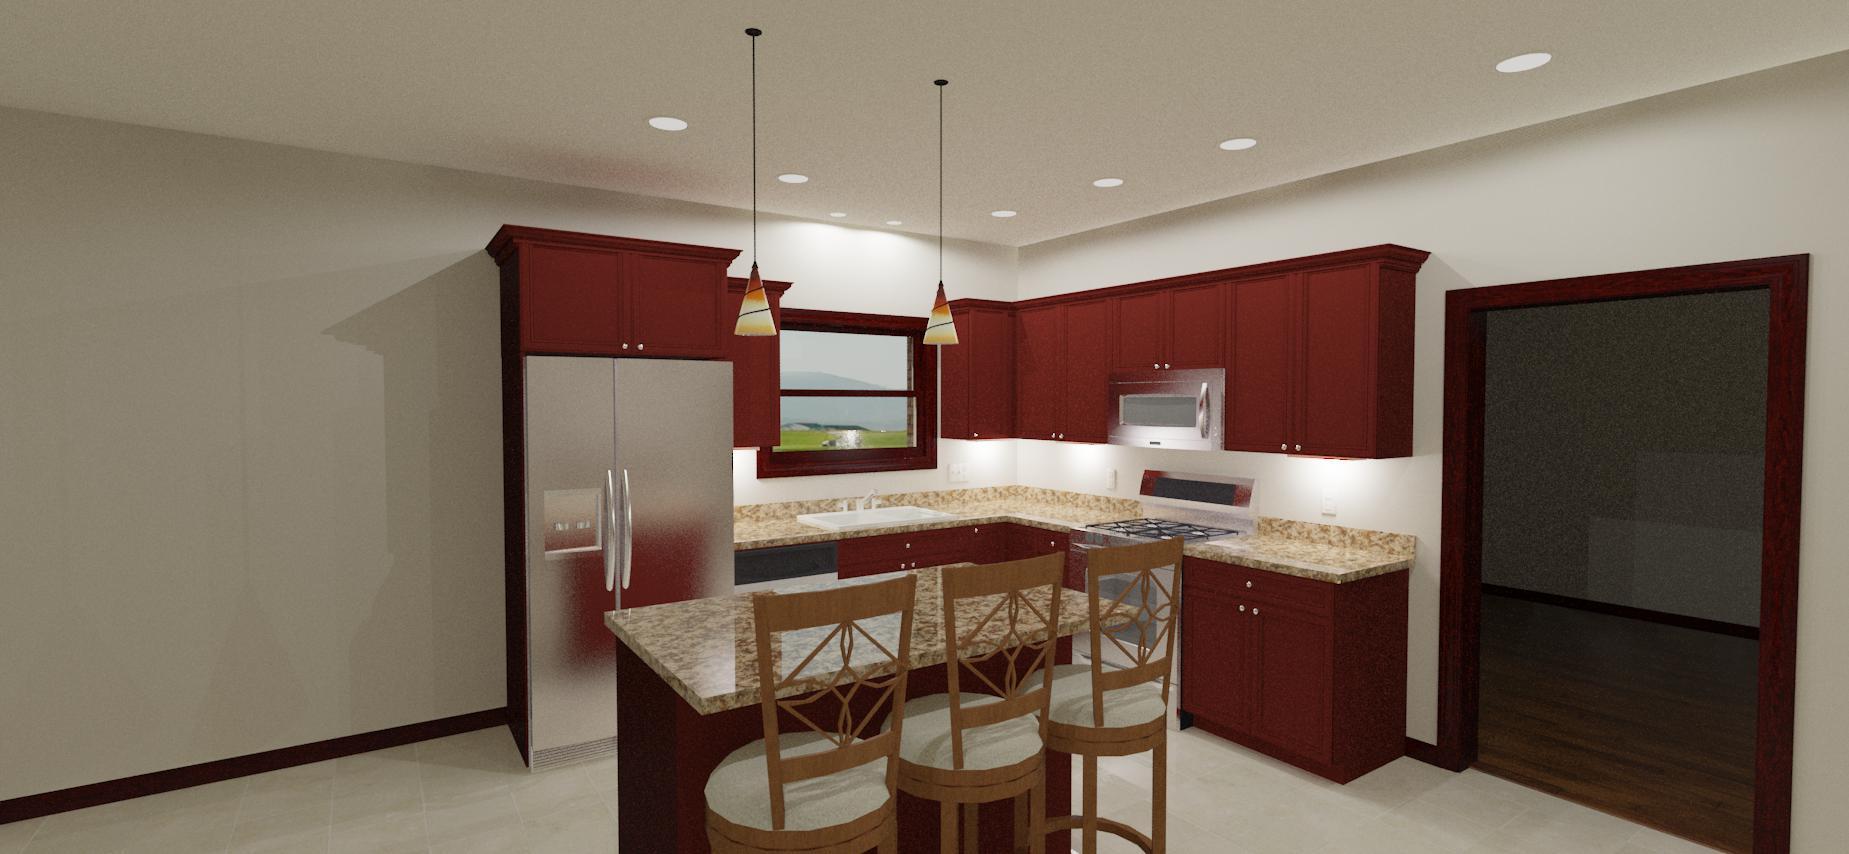 Recessed Lighting Layout Kitchen  Lighting Ideas